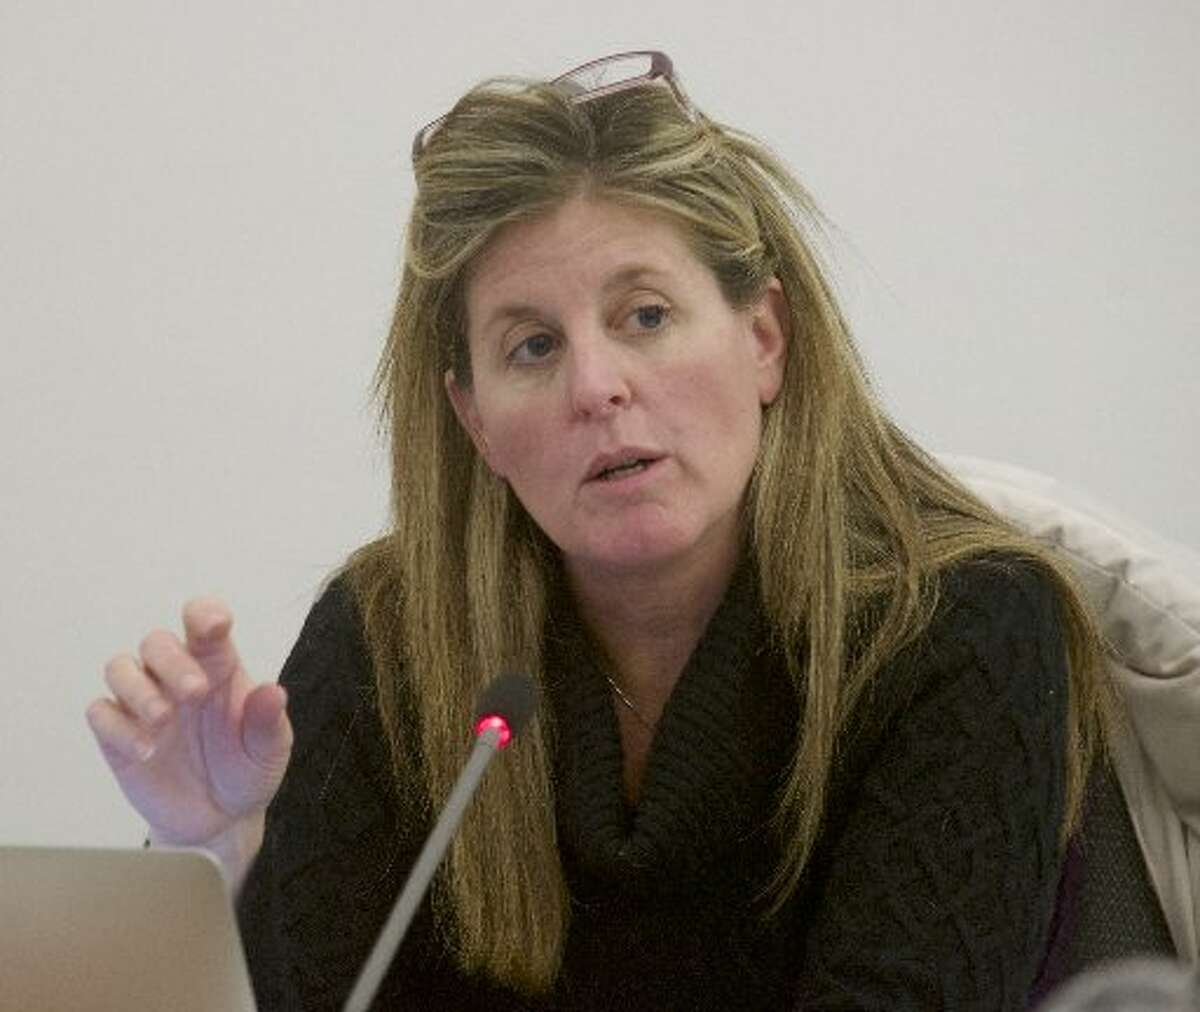 former Newtown school board member Kathryn Hamilton